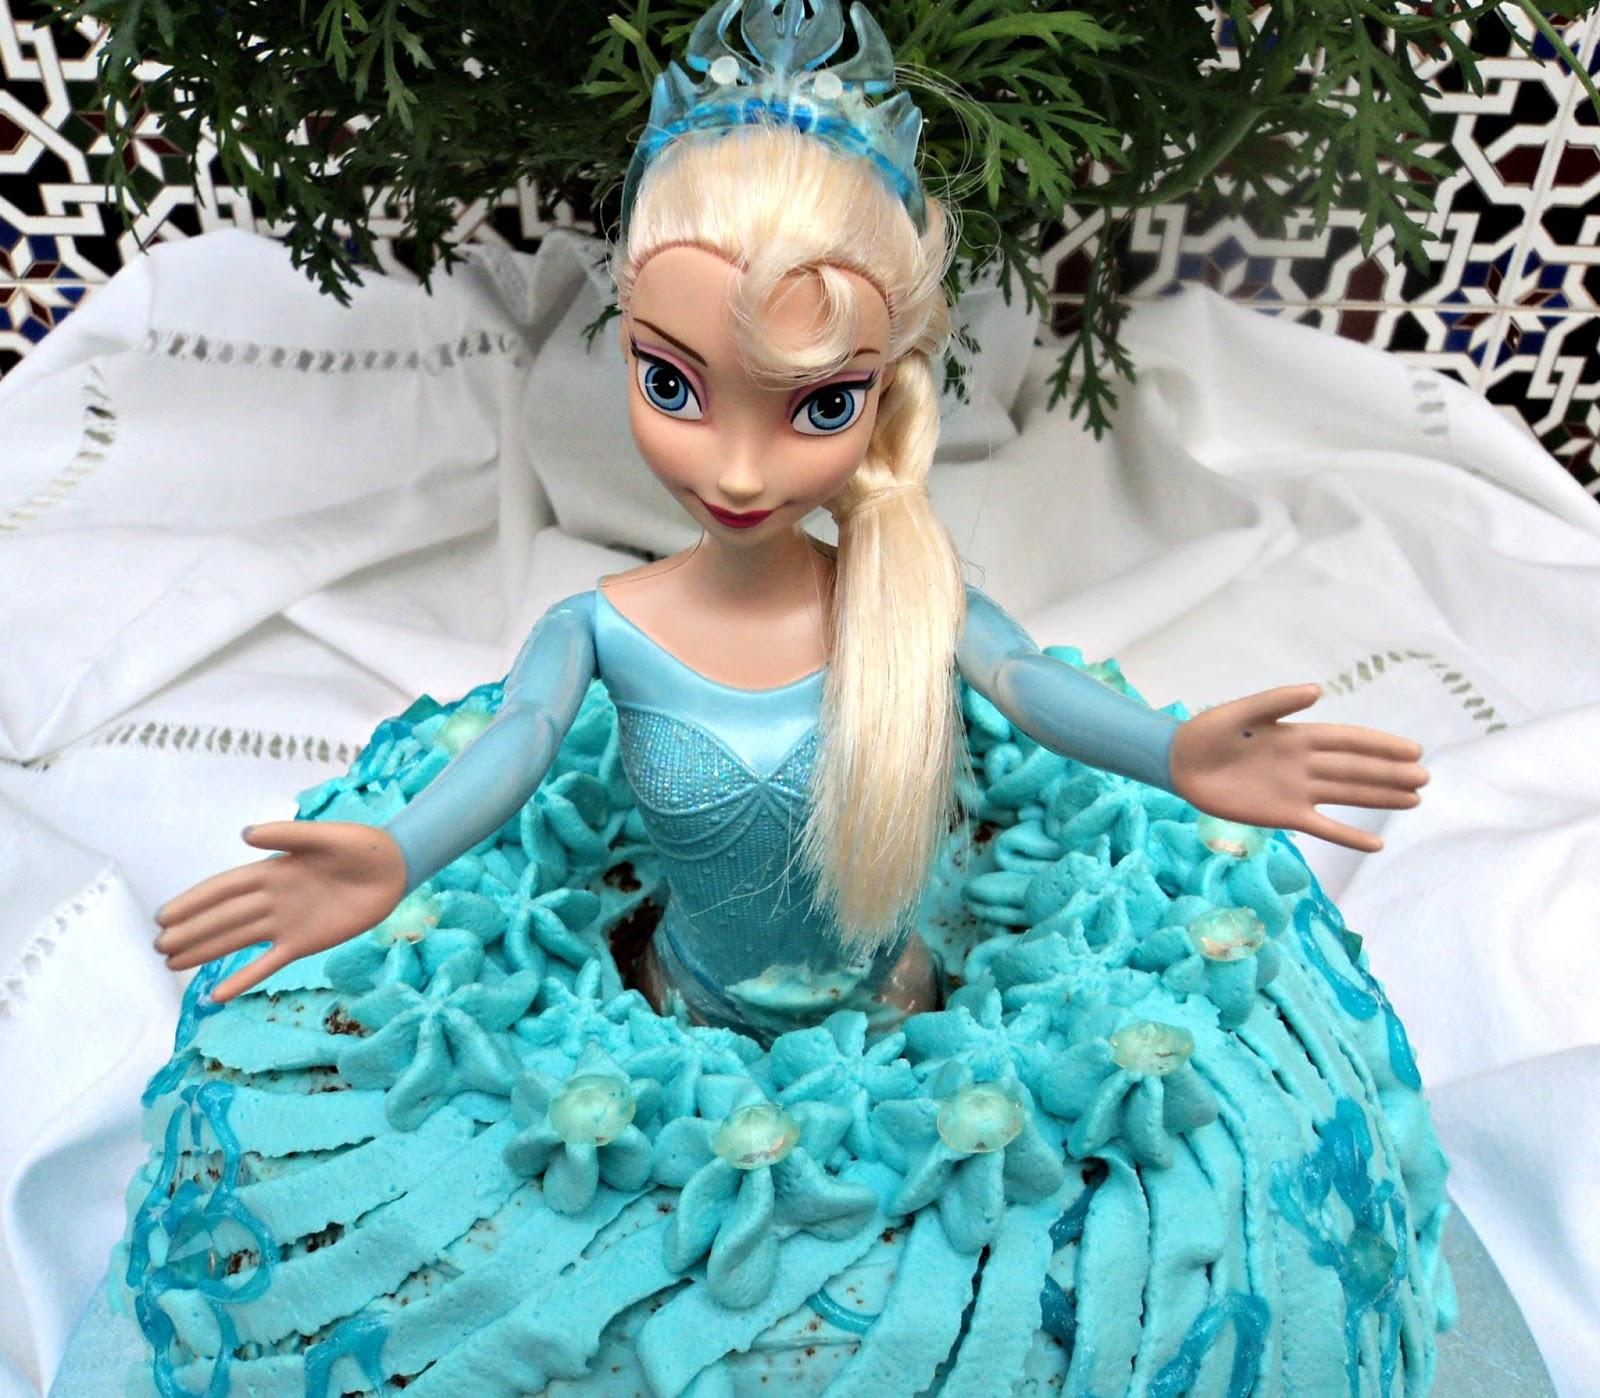 141009092513 600 disney frozen wedding dress - Vestidos De Frozen En Los Angeles California